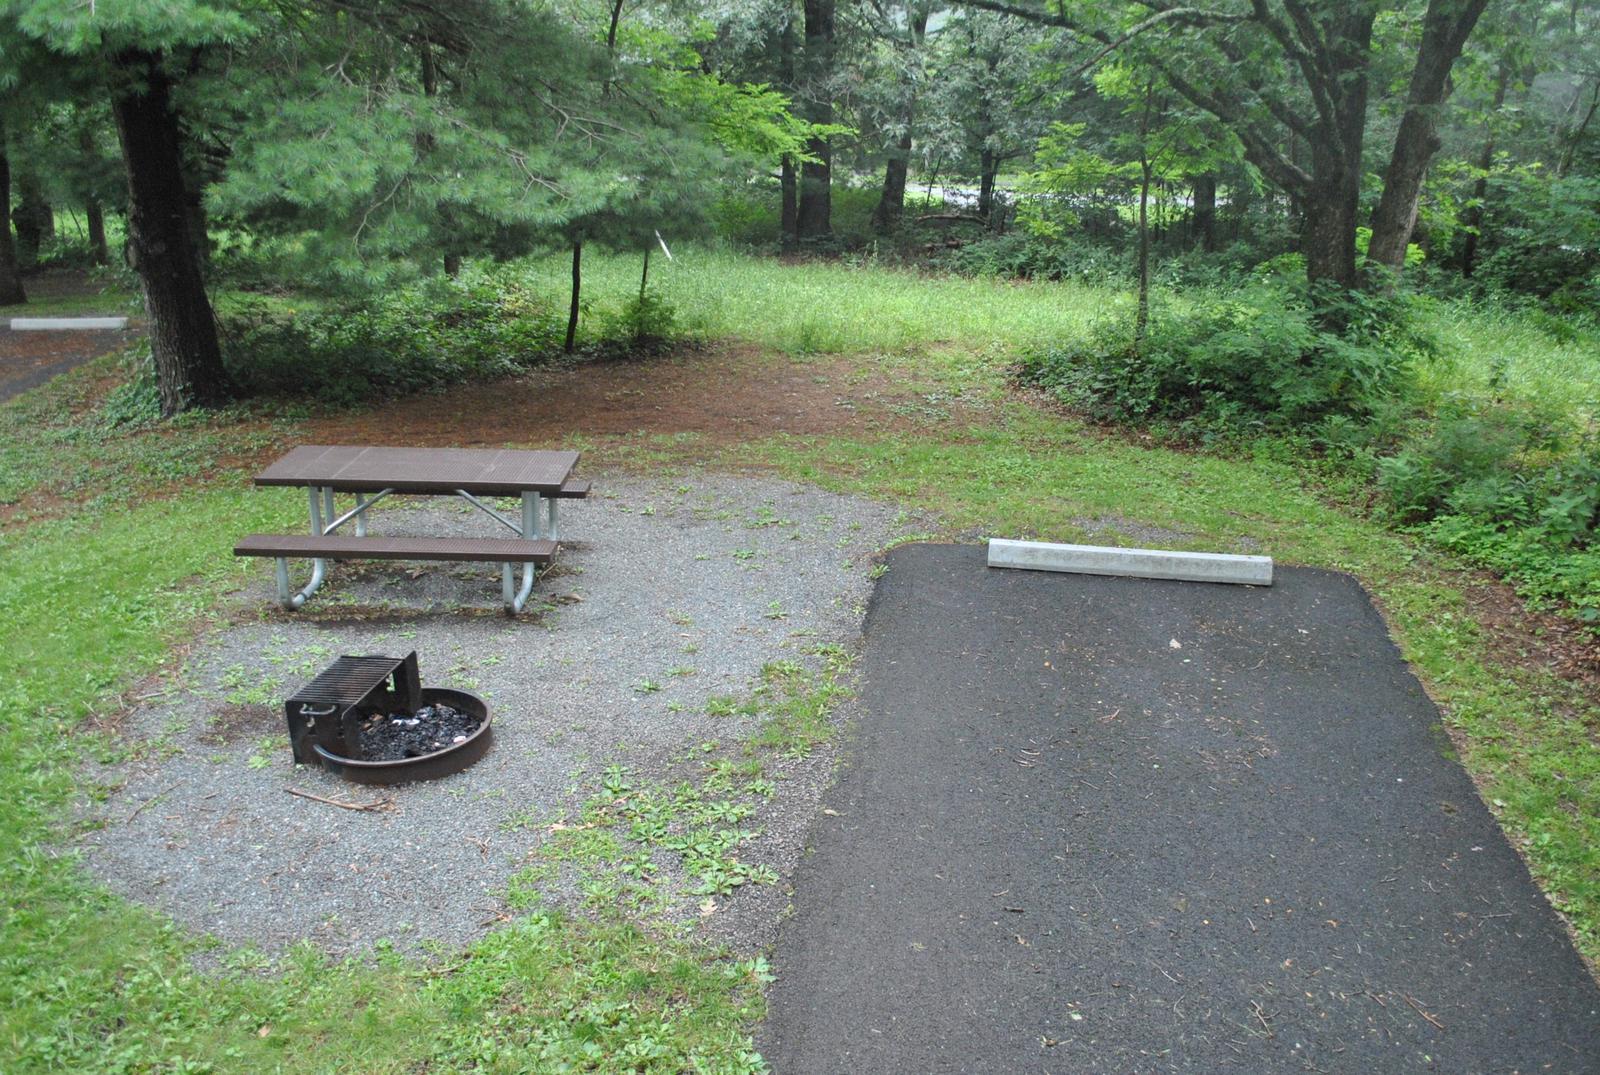 Mathews Arm Campground – Site A018